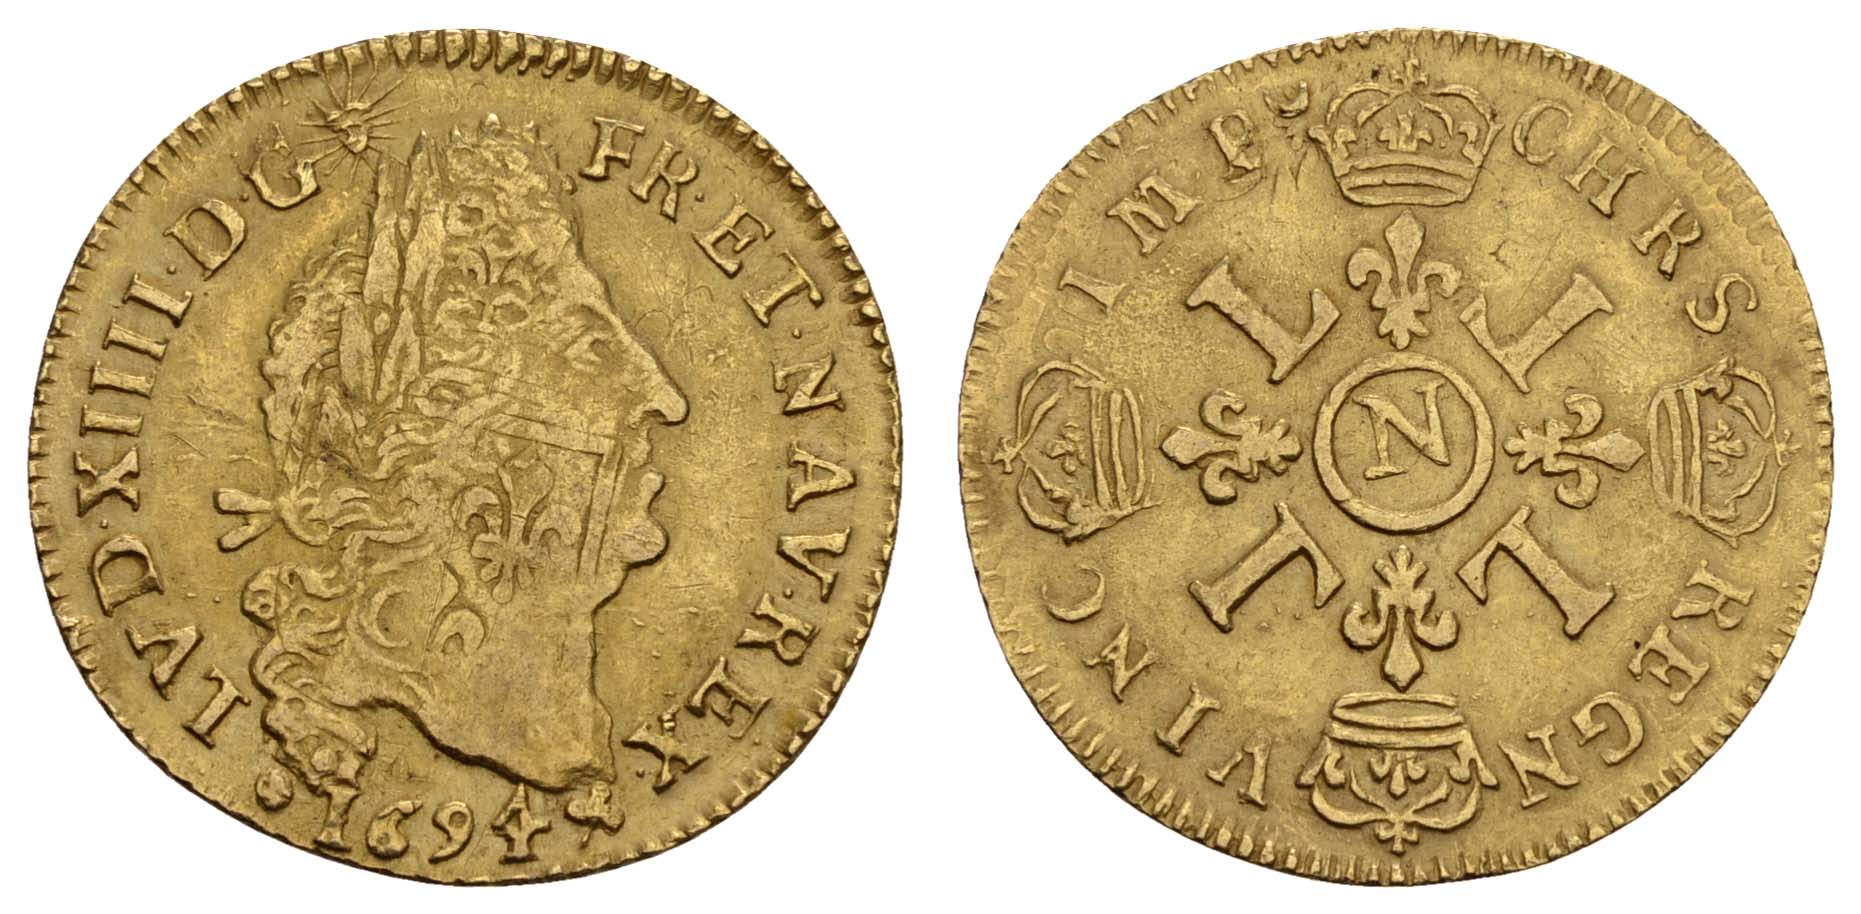 Lot 1295 - europa bis 1799 - Frankreich -  Auktionshaus Ulrich Felzmann GmbH & Co. KG Coins single lots